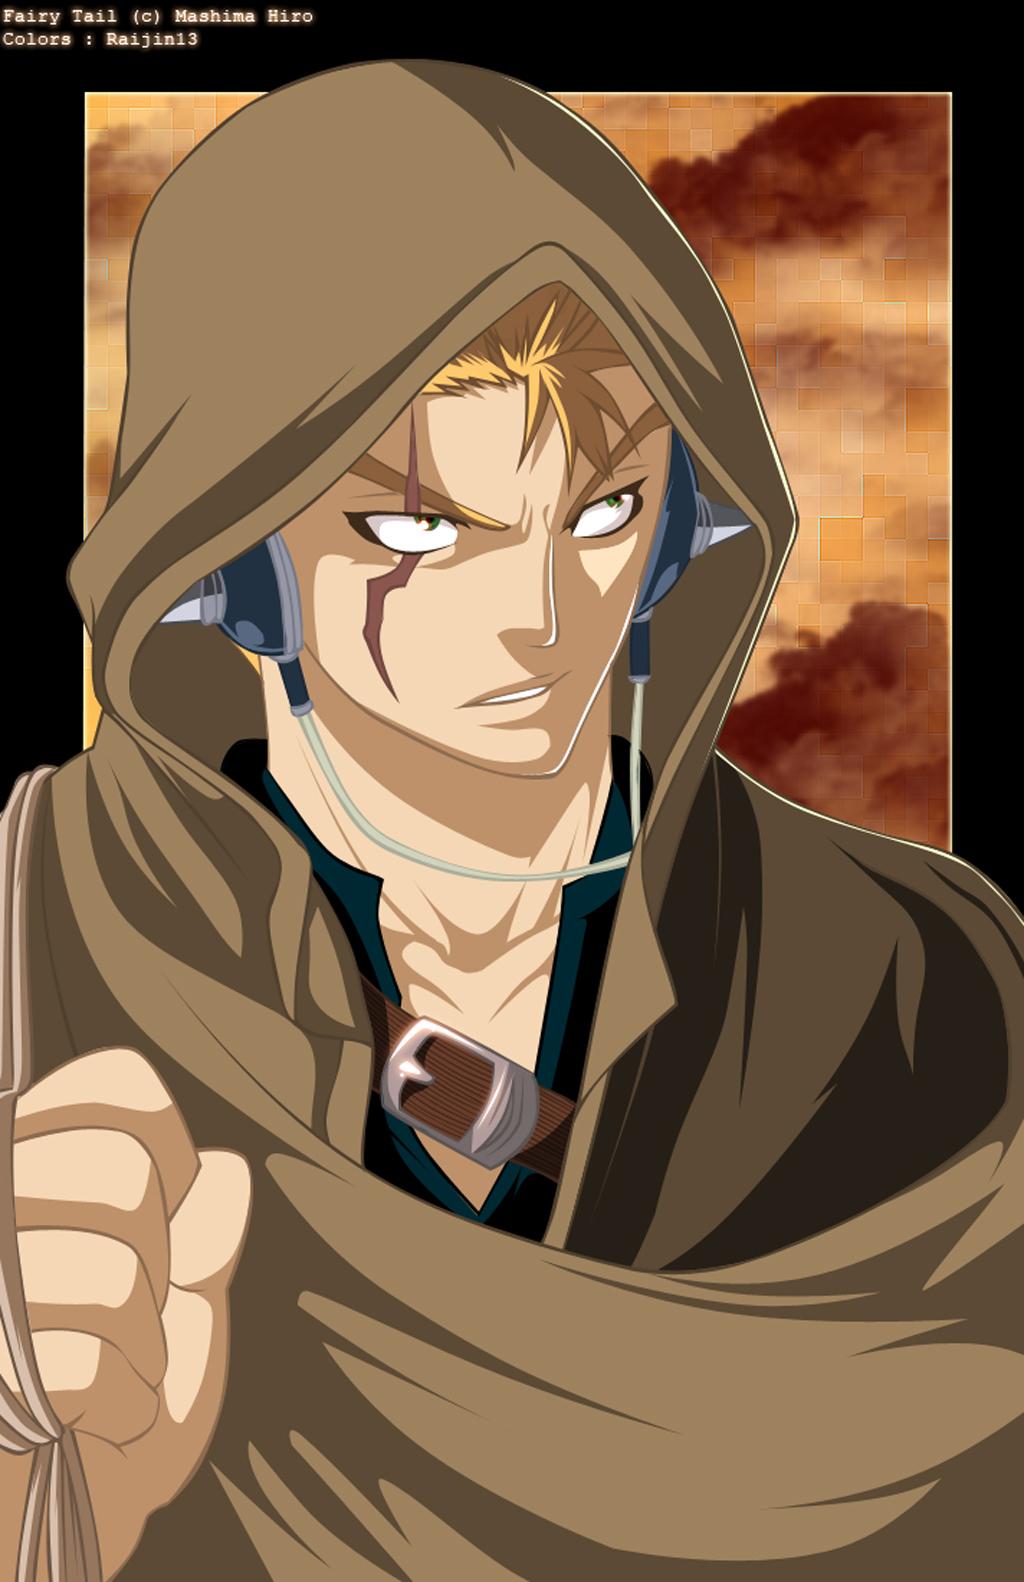 Laxus Dreyar - FAIRY TAIL - Zerochan Anime Image Board